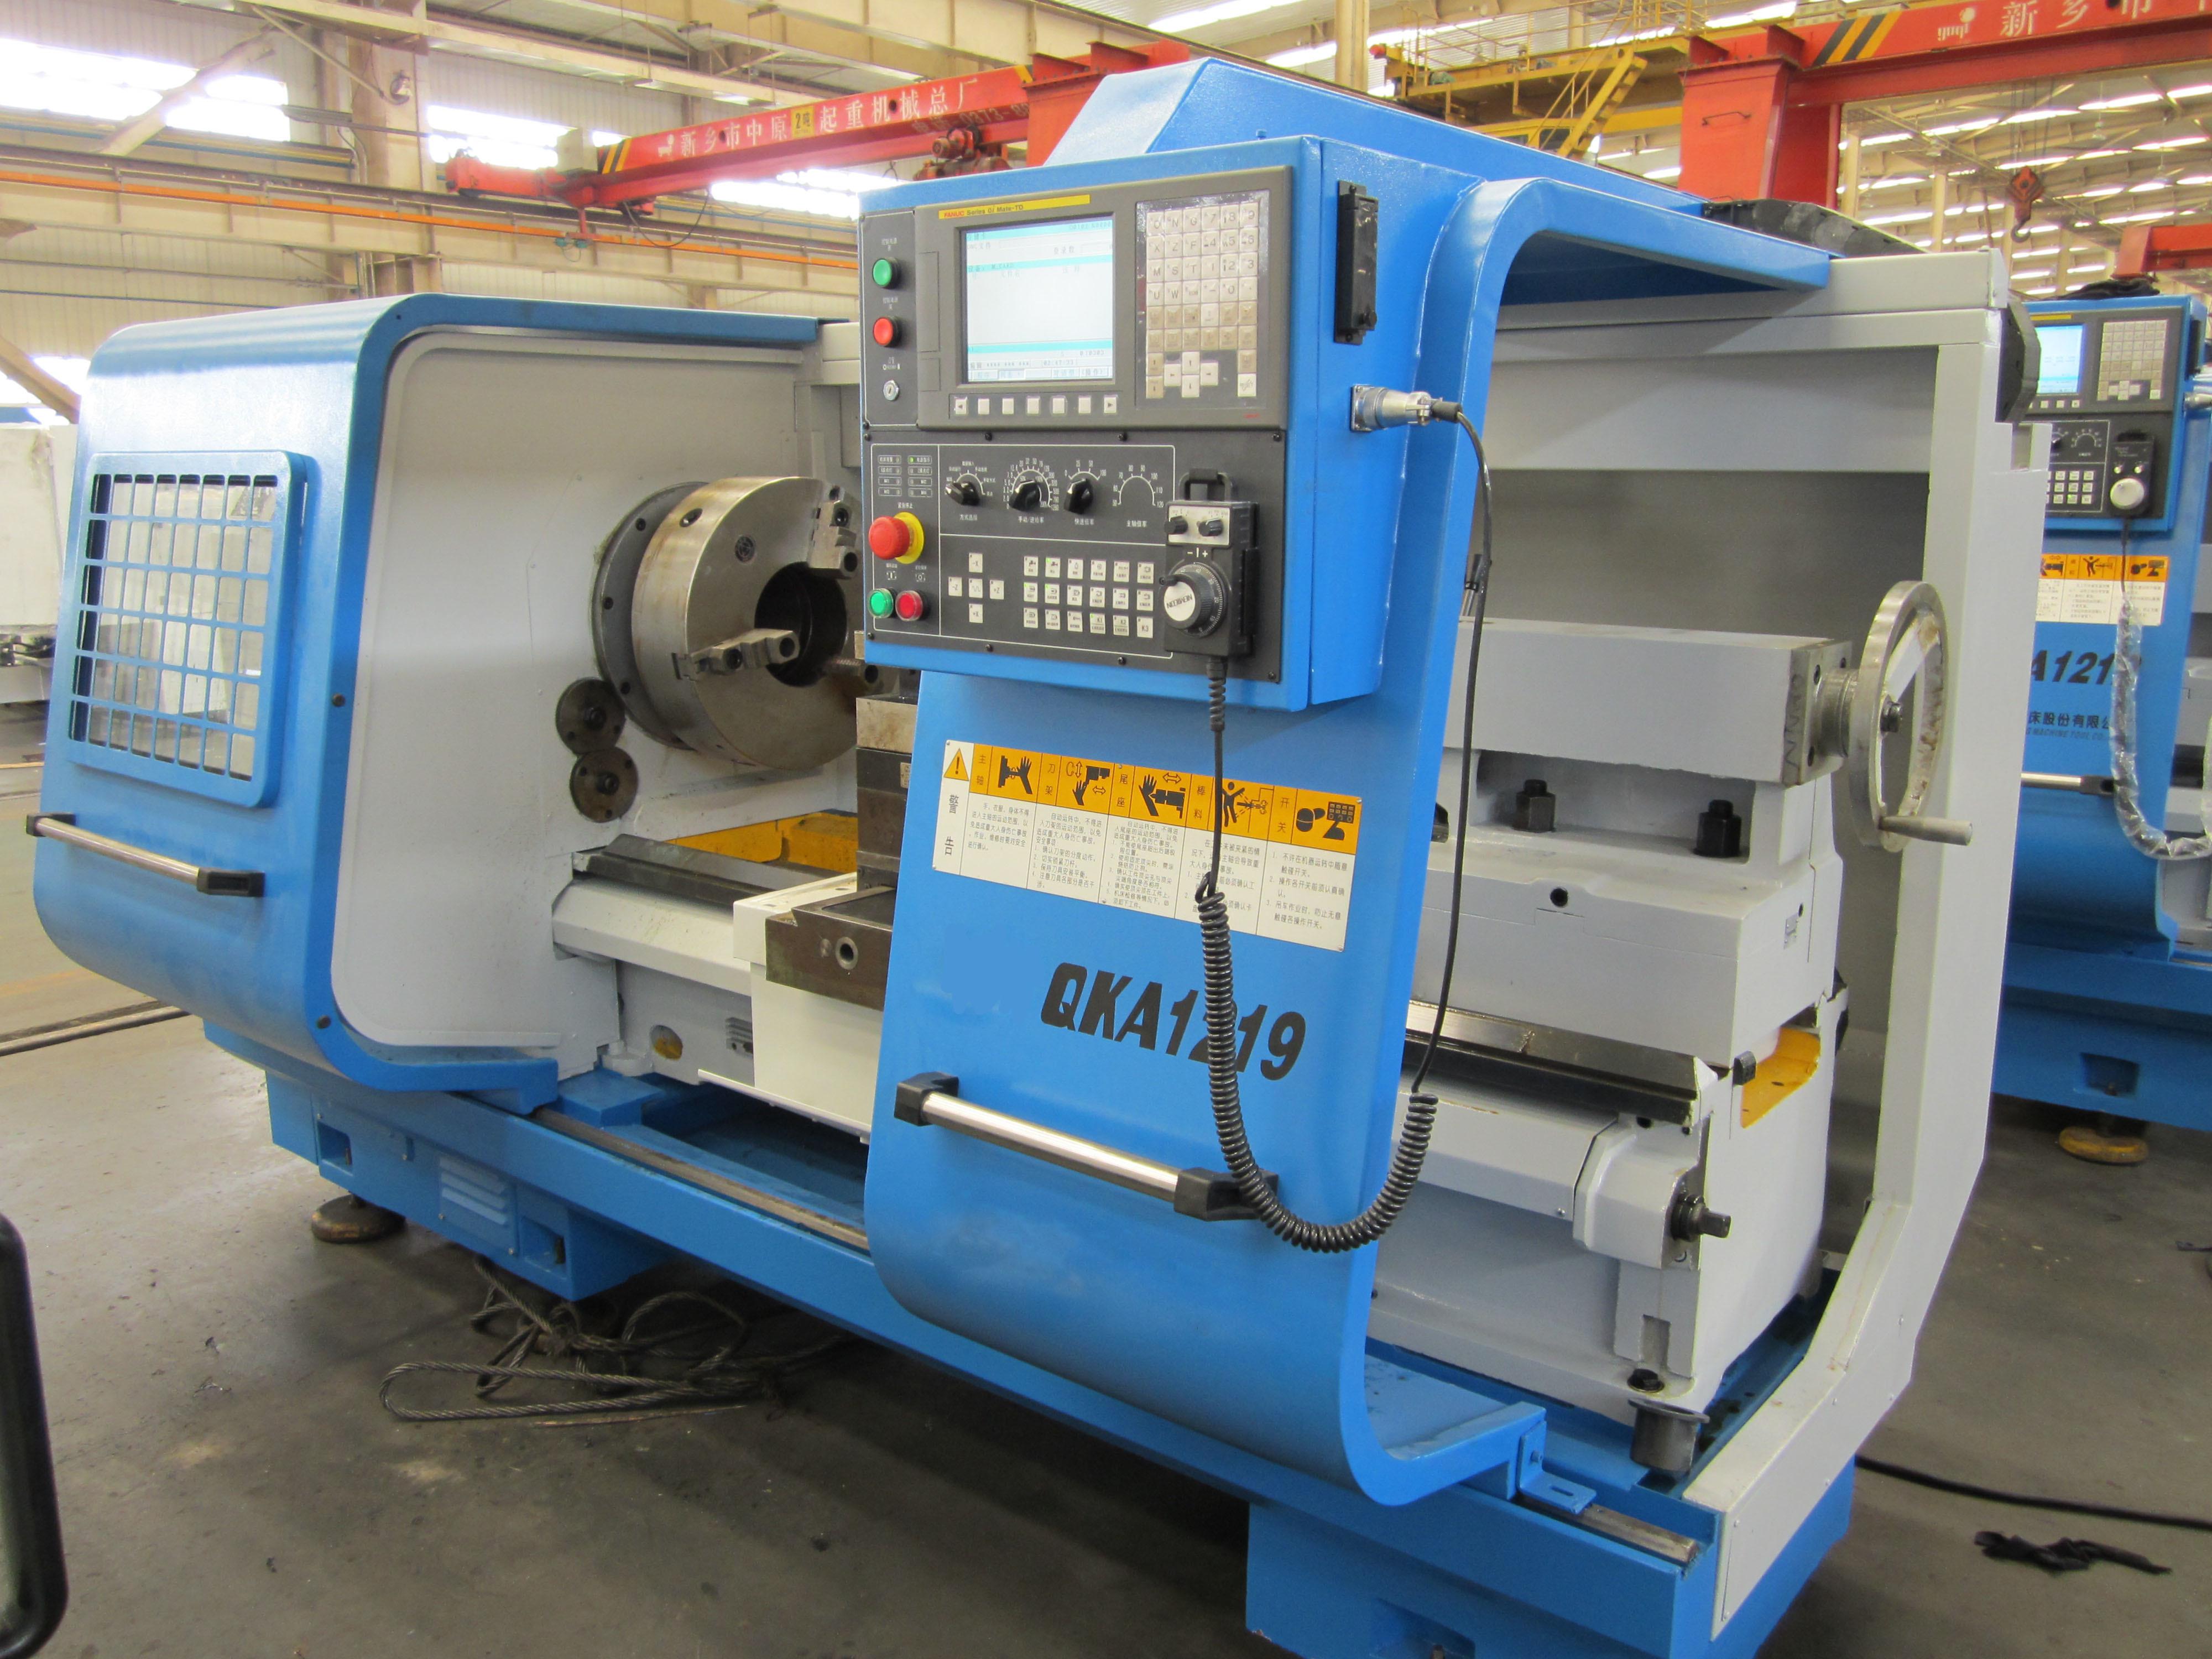 FANUC control Pipe Threading Lathe QKP1219 China Supplier